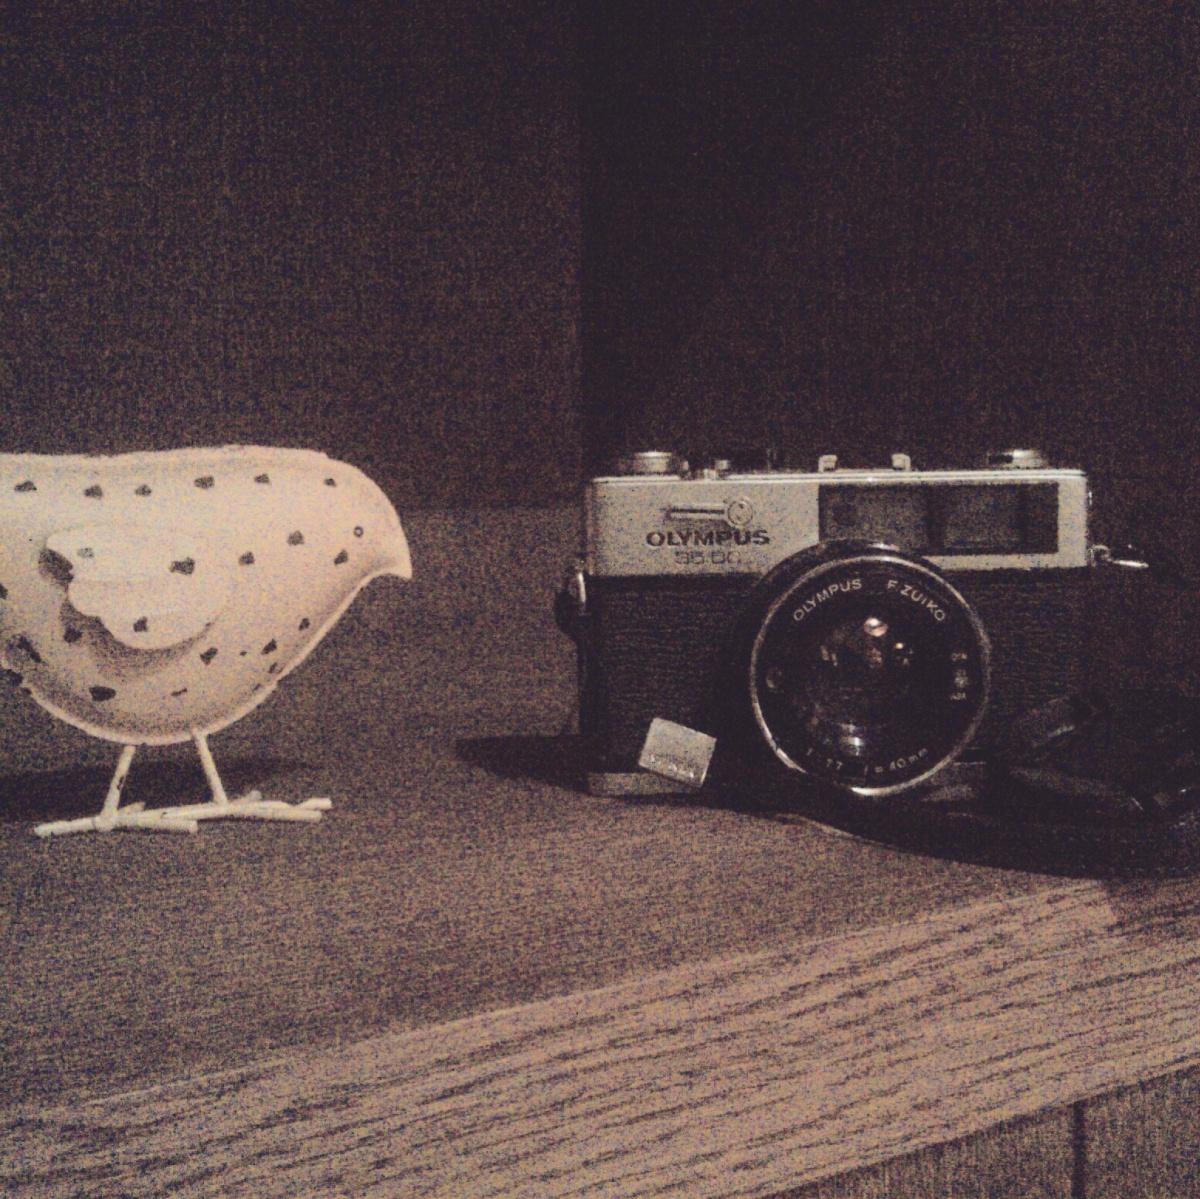 My cameras - Olympus 35DC